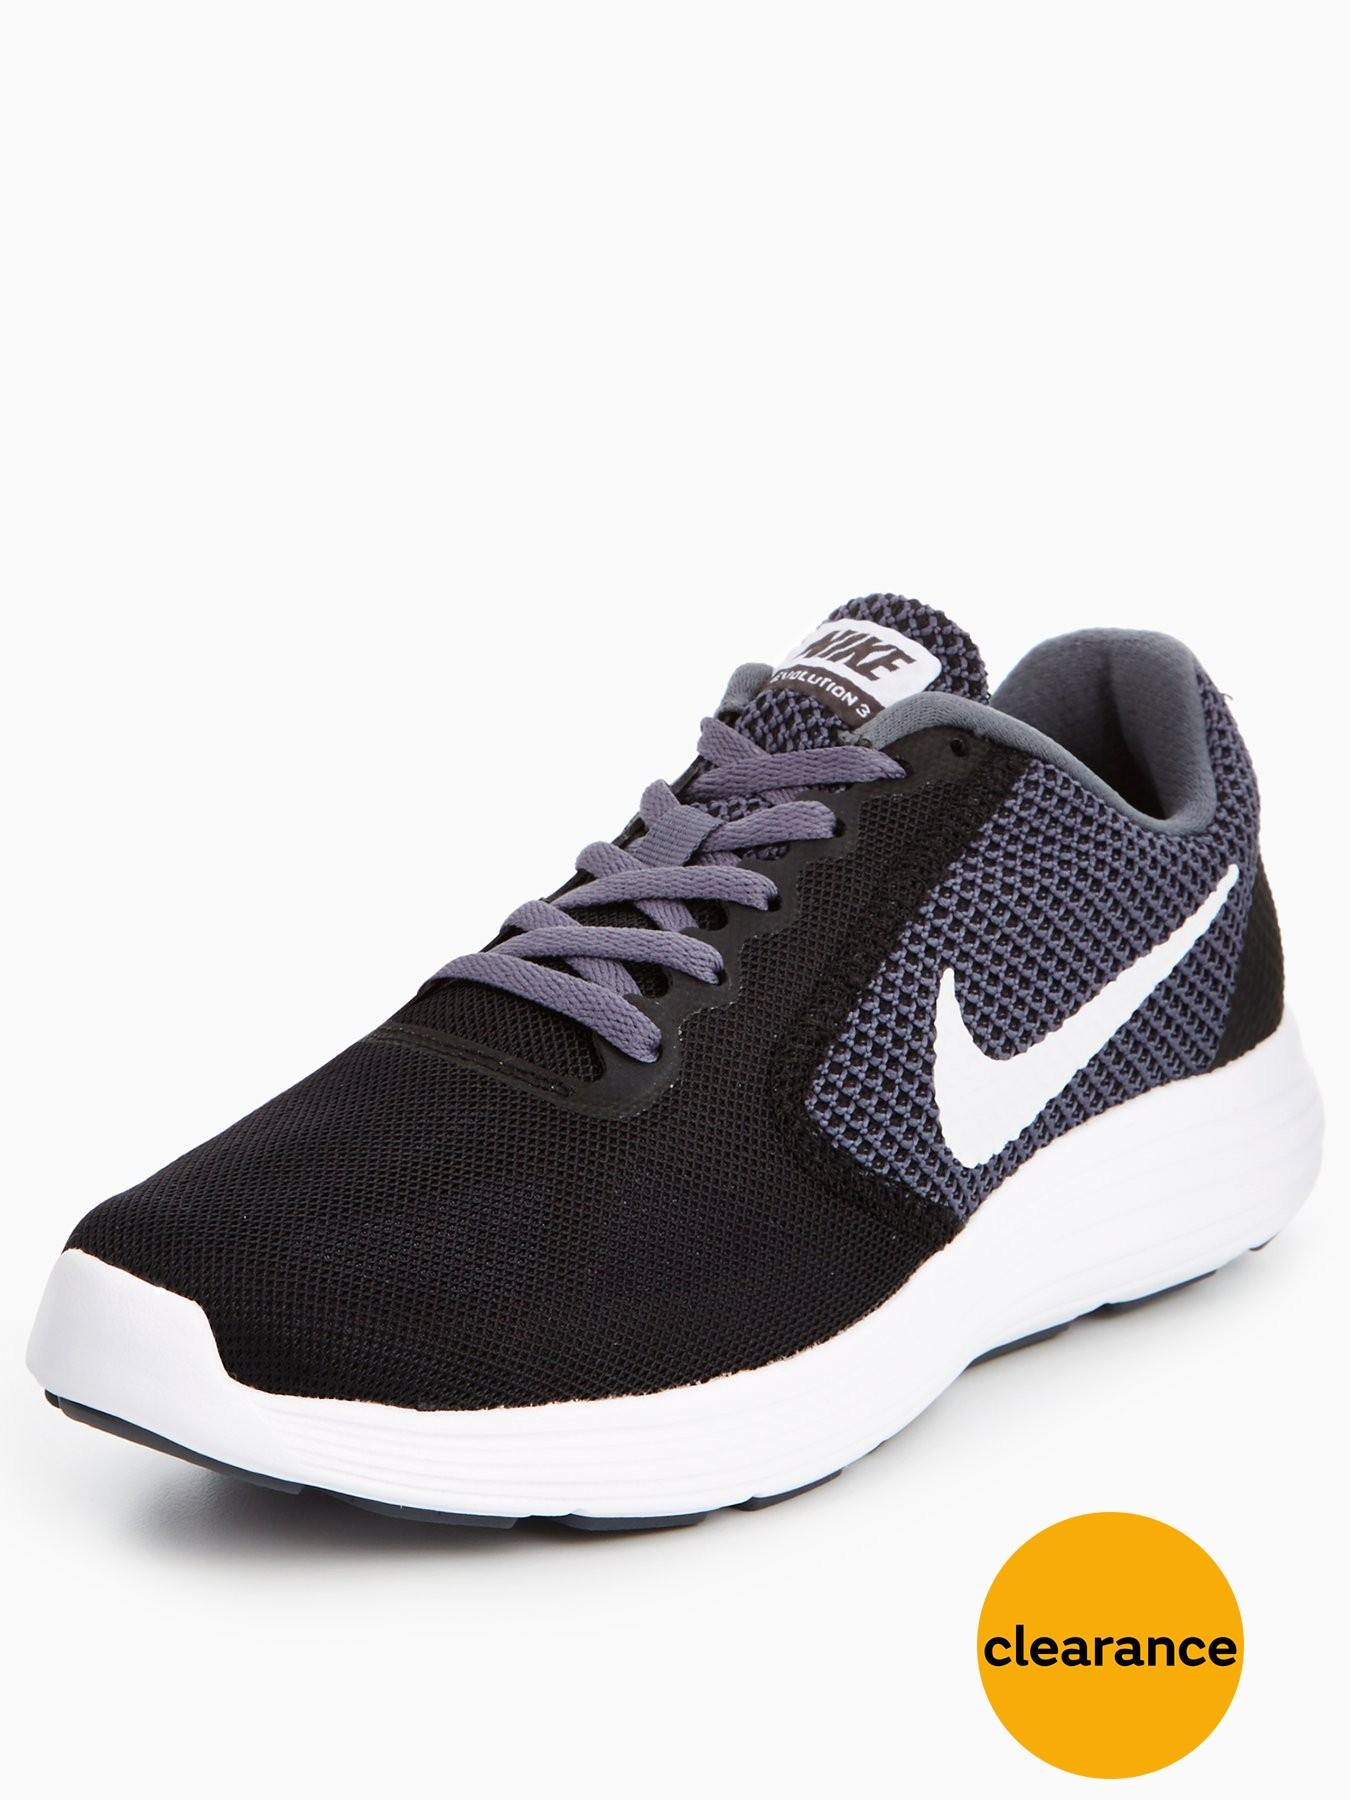 Nike Revolution 3 Black/White 1600164092 Women's Shoes Nike Trainers